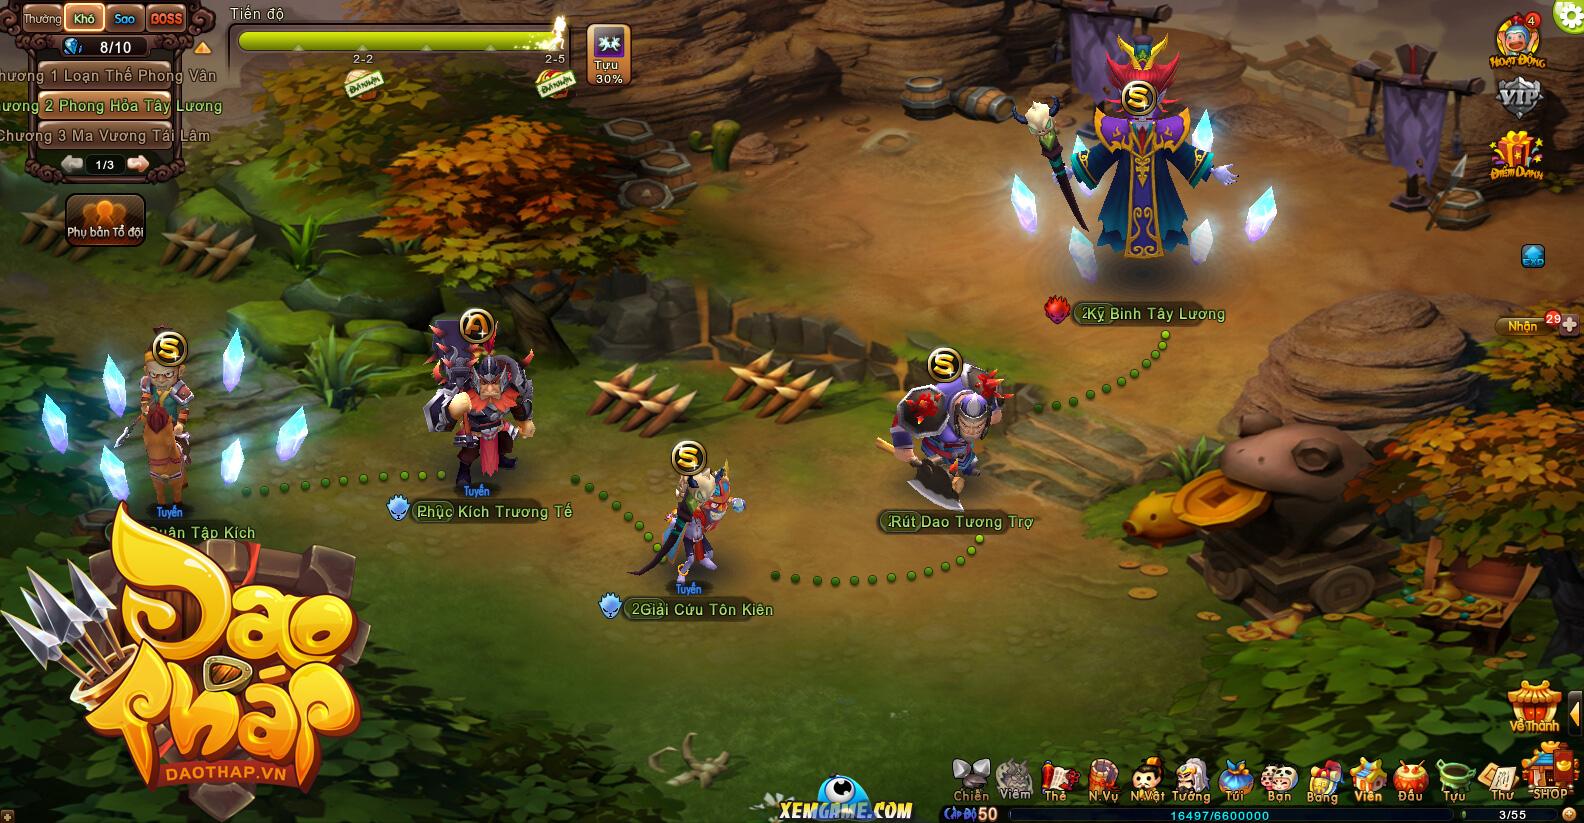 game-dao-thap-online-9.jpg (1584×823)